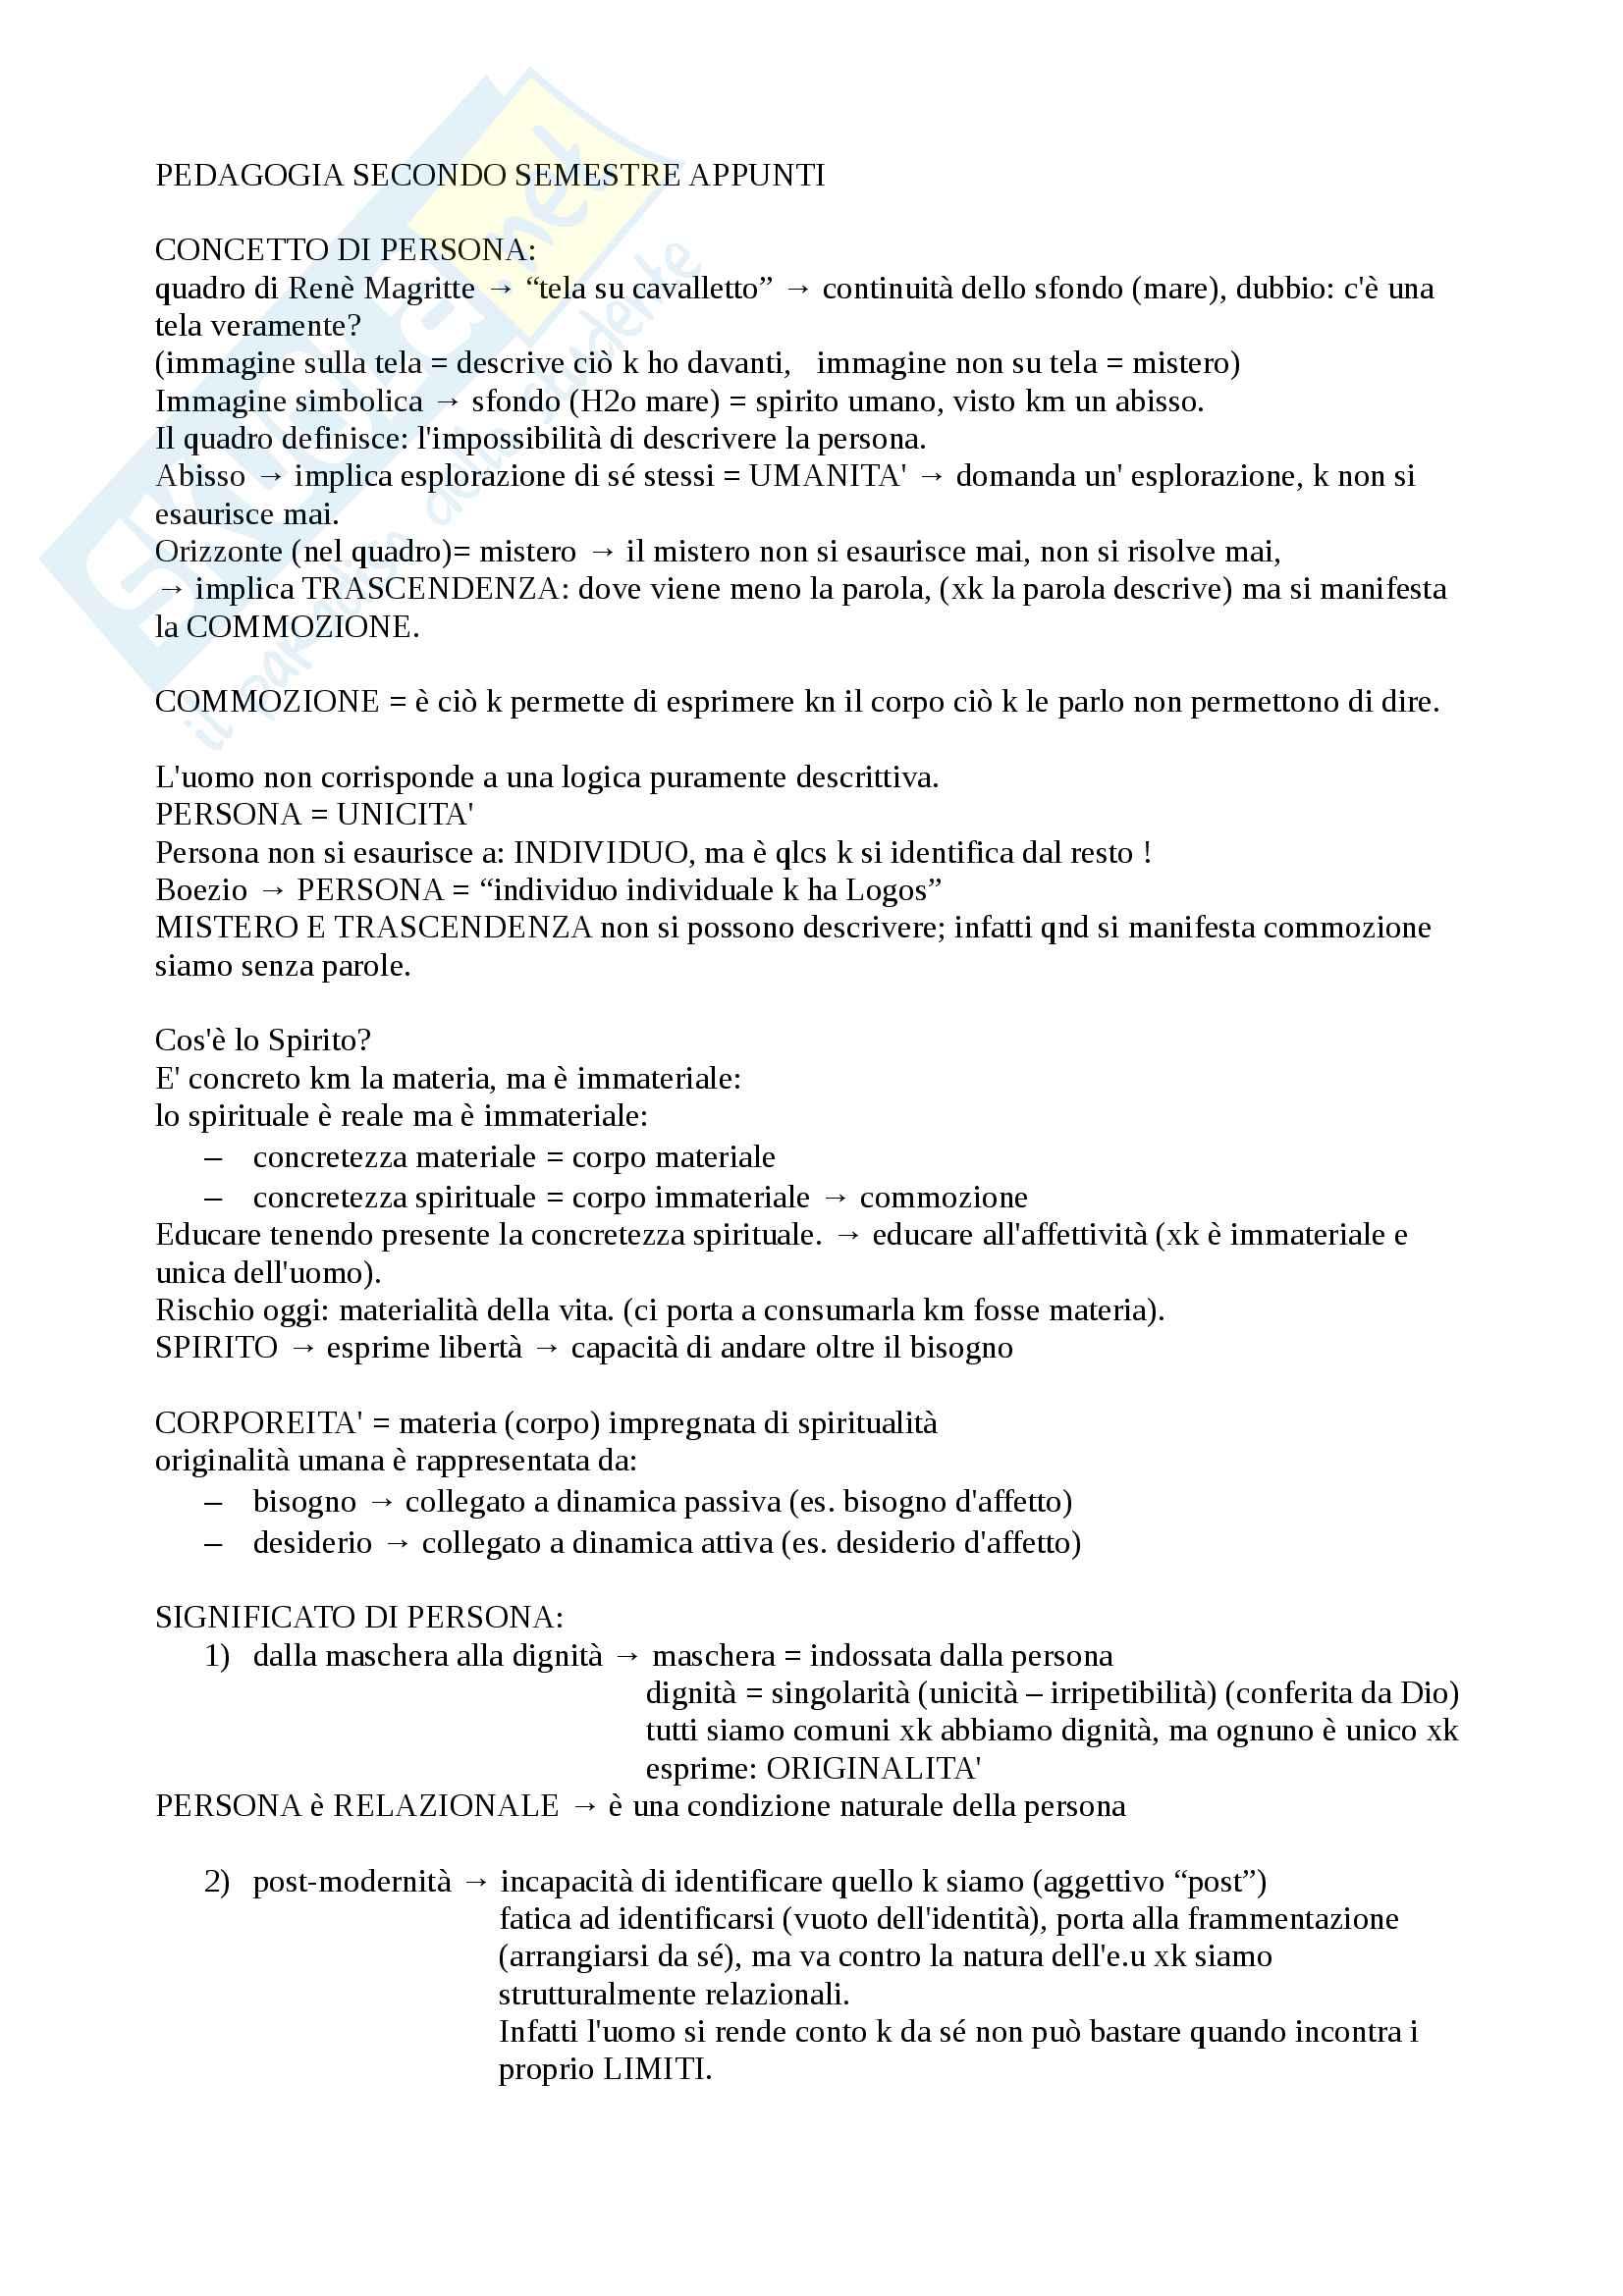 Appunti Pedagogia II Semestre